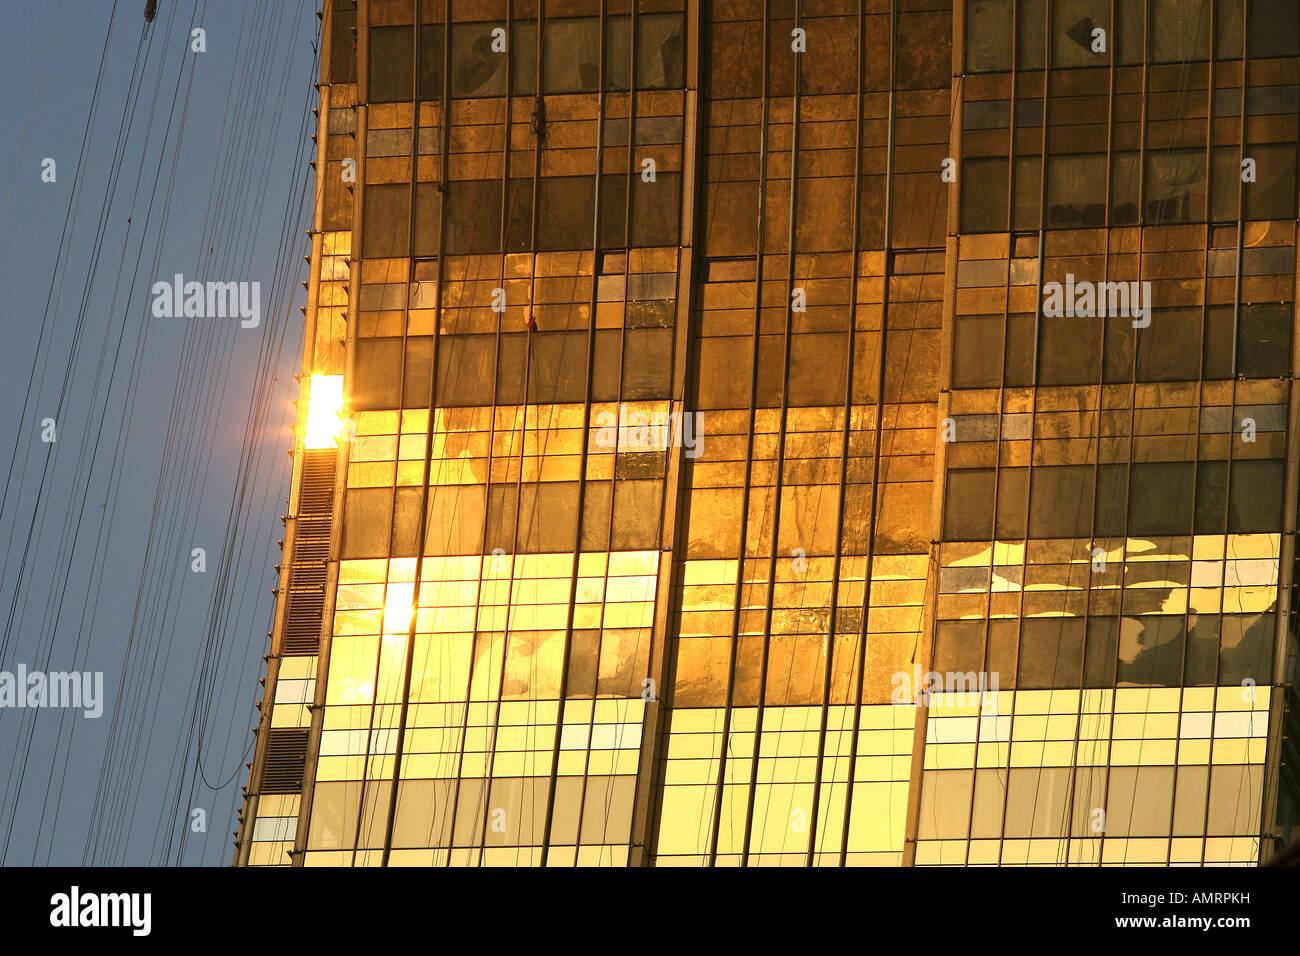 The new Lisboa hotel in Macau China - Stock Image